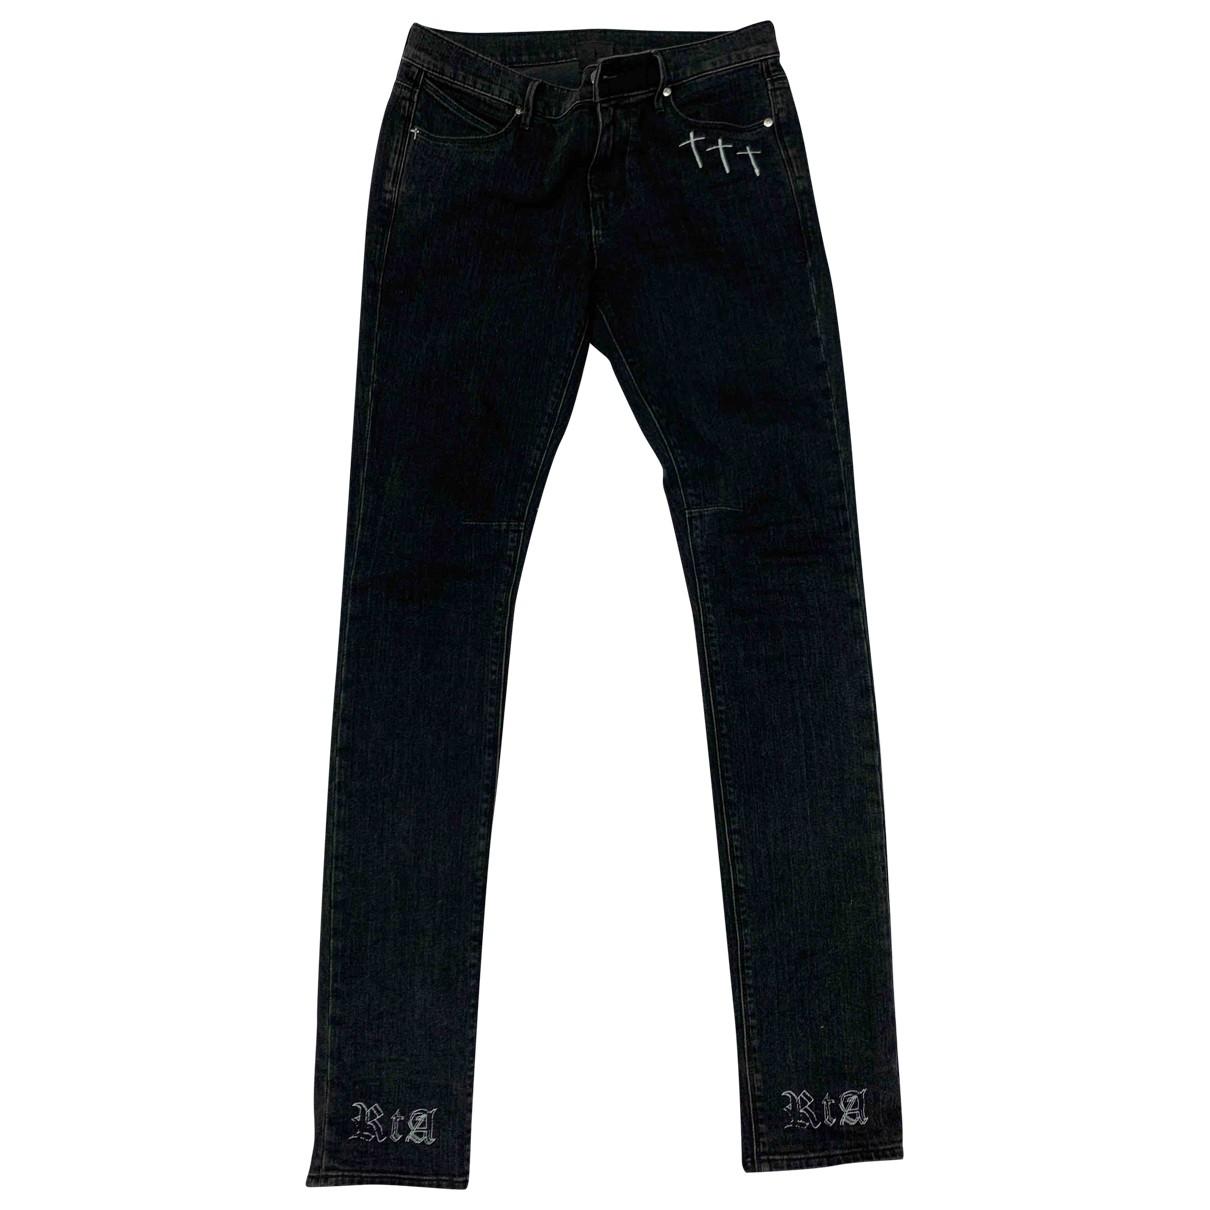 Rta \N Black Cotton - elasthane Jeans for Men 30 US